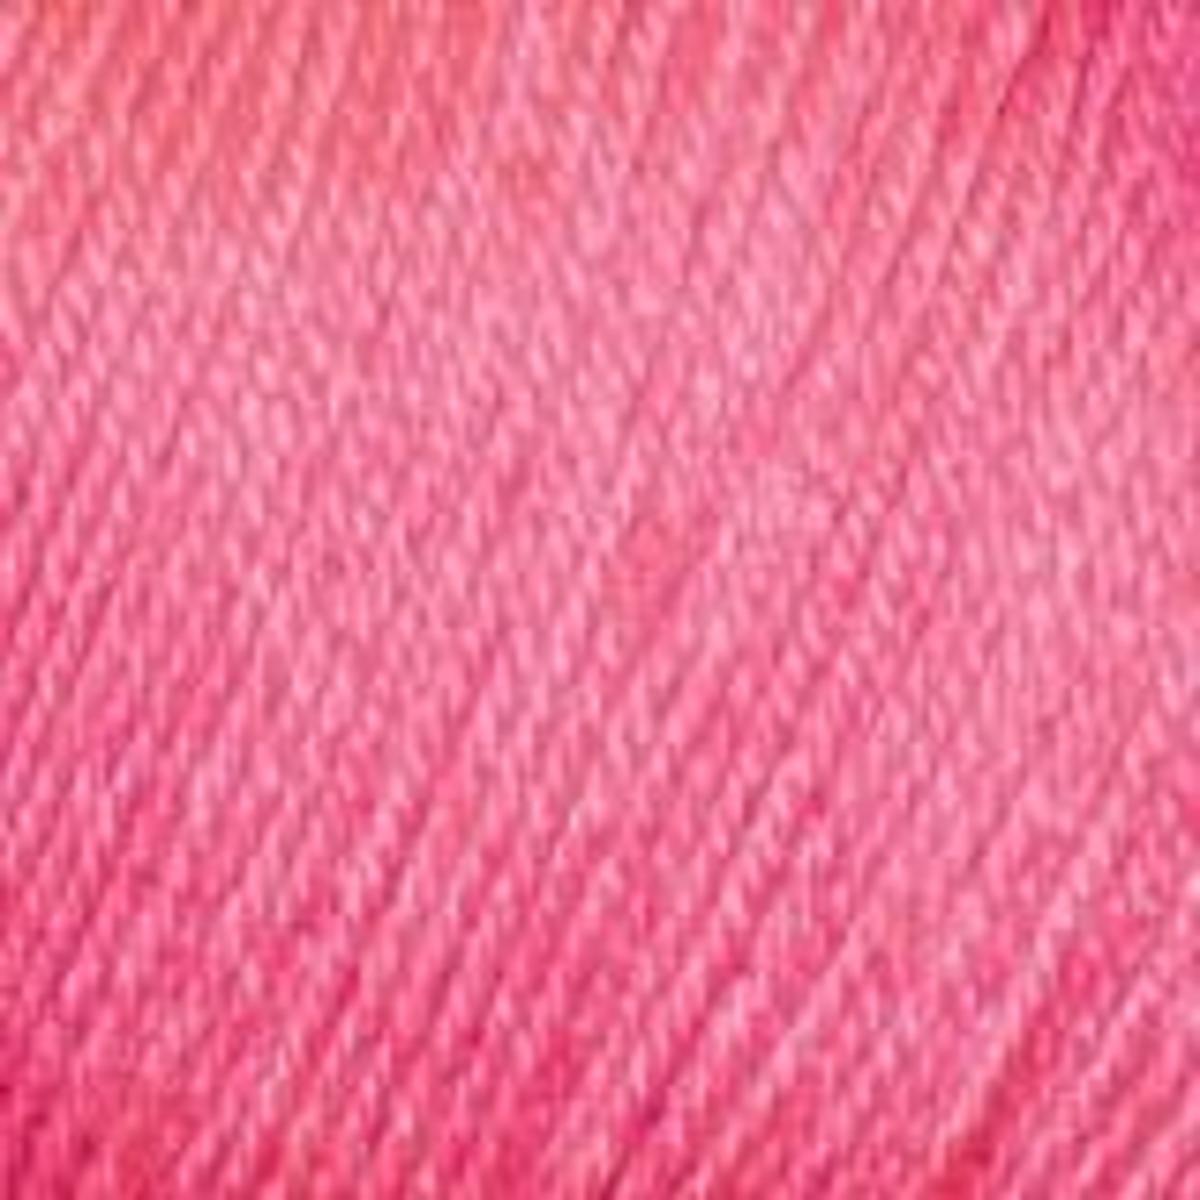 Пряжа ALIZE 'Baby wool' 50гр. 175м. (20%бамбук, 40%шерсть, 40%акрил)ТУ (33) фото